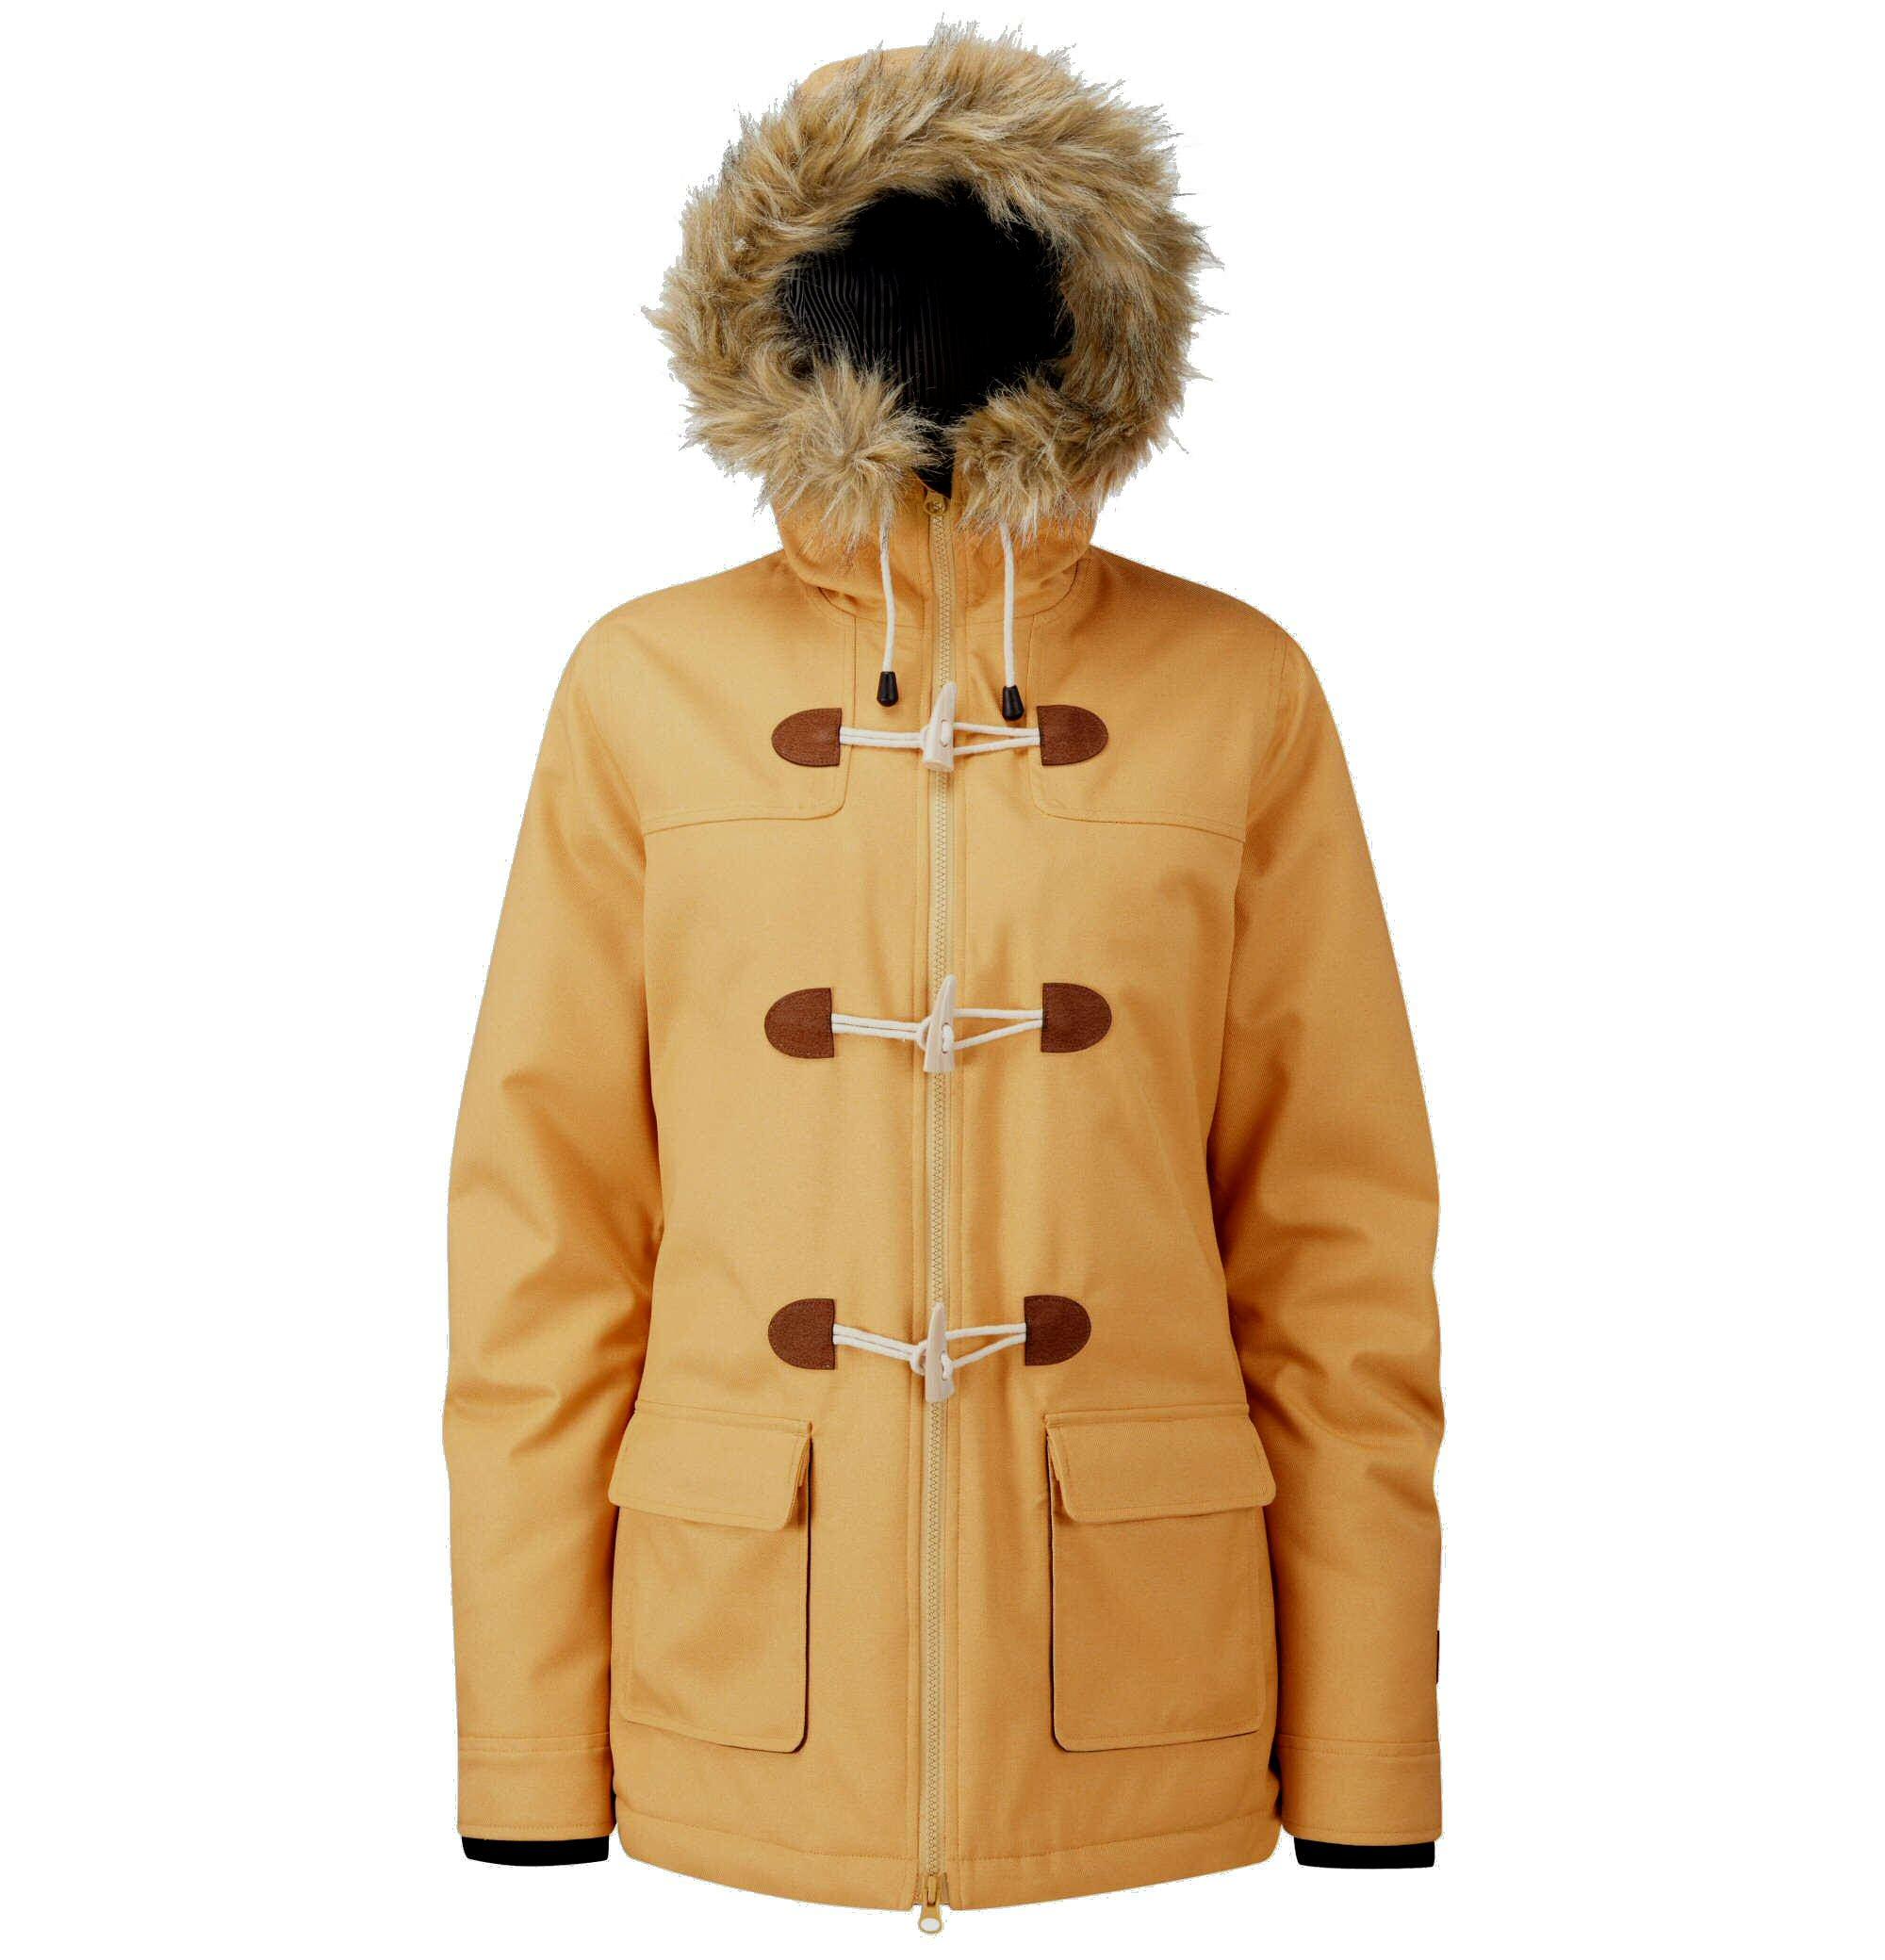 01ce231460 Westbeach Beatty Ski Jacket in Kalahari